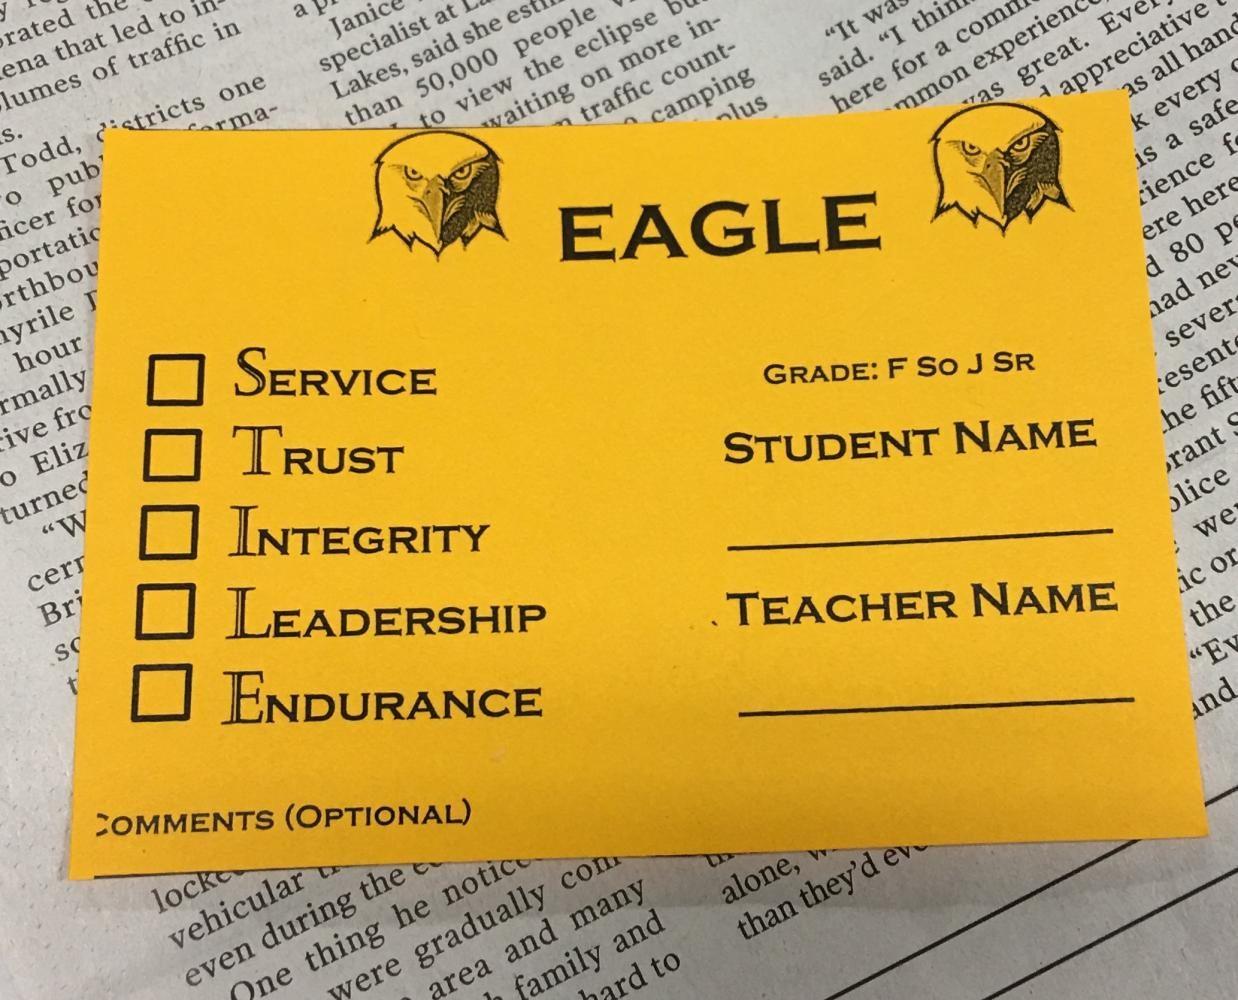 GCHS STILE cards result in increase of positive student behavior